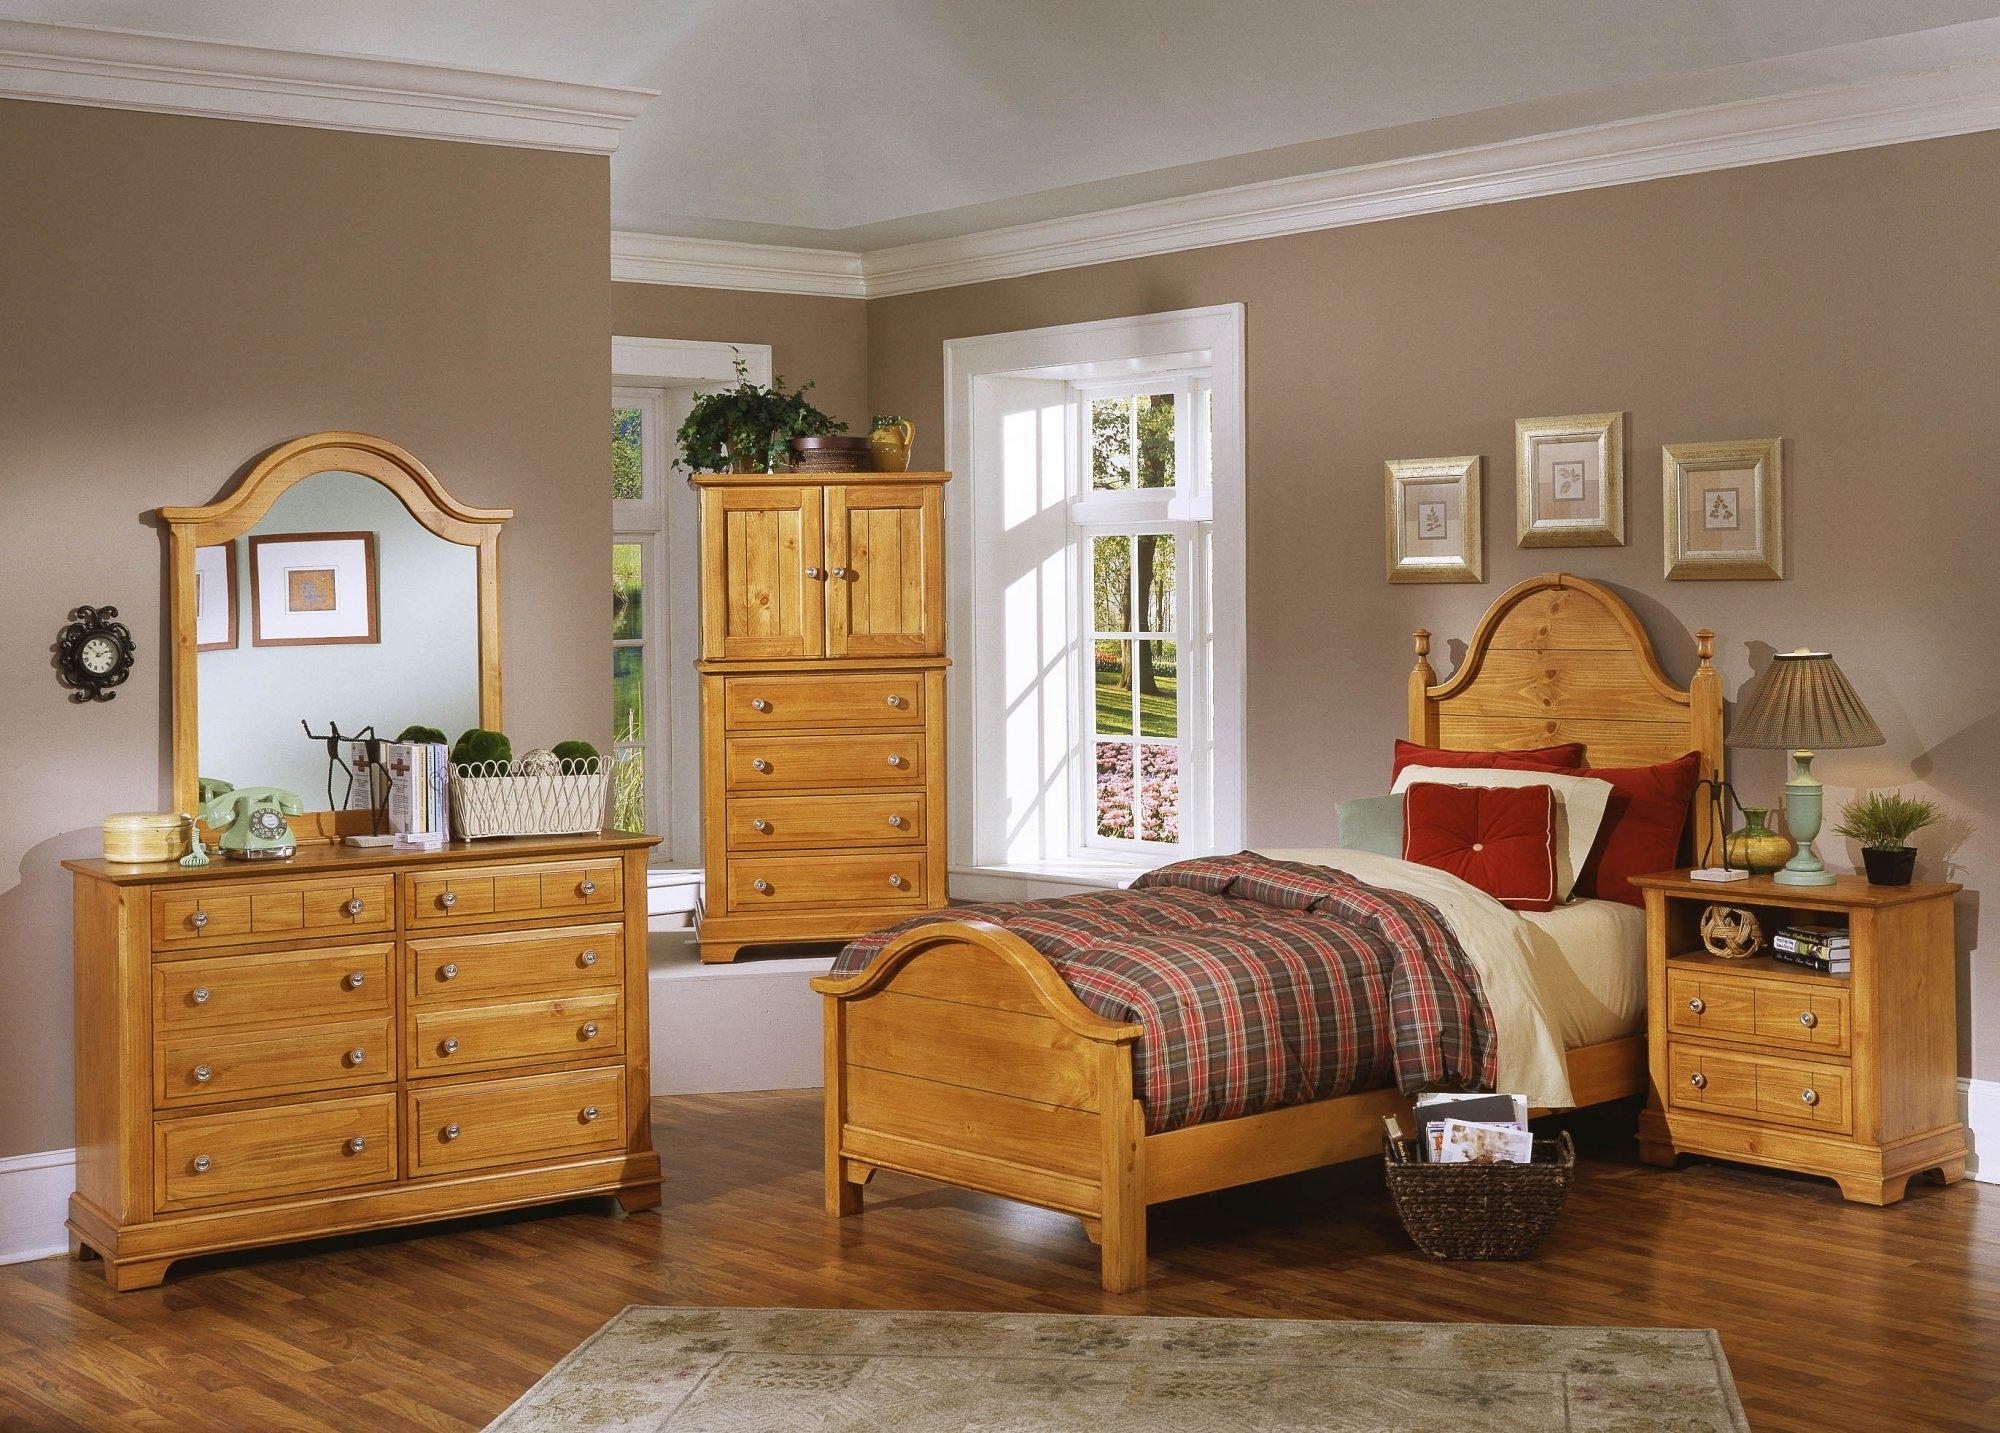 Home Bedroom Designs Inspirational Pine Bedroom Furniture Arouse